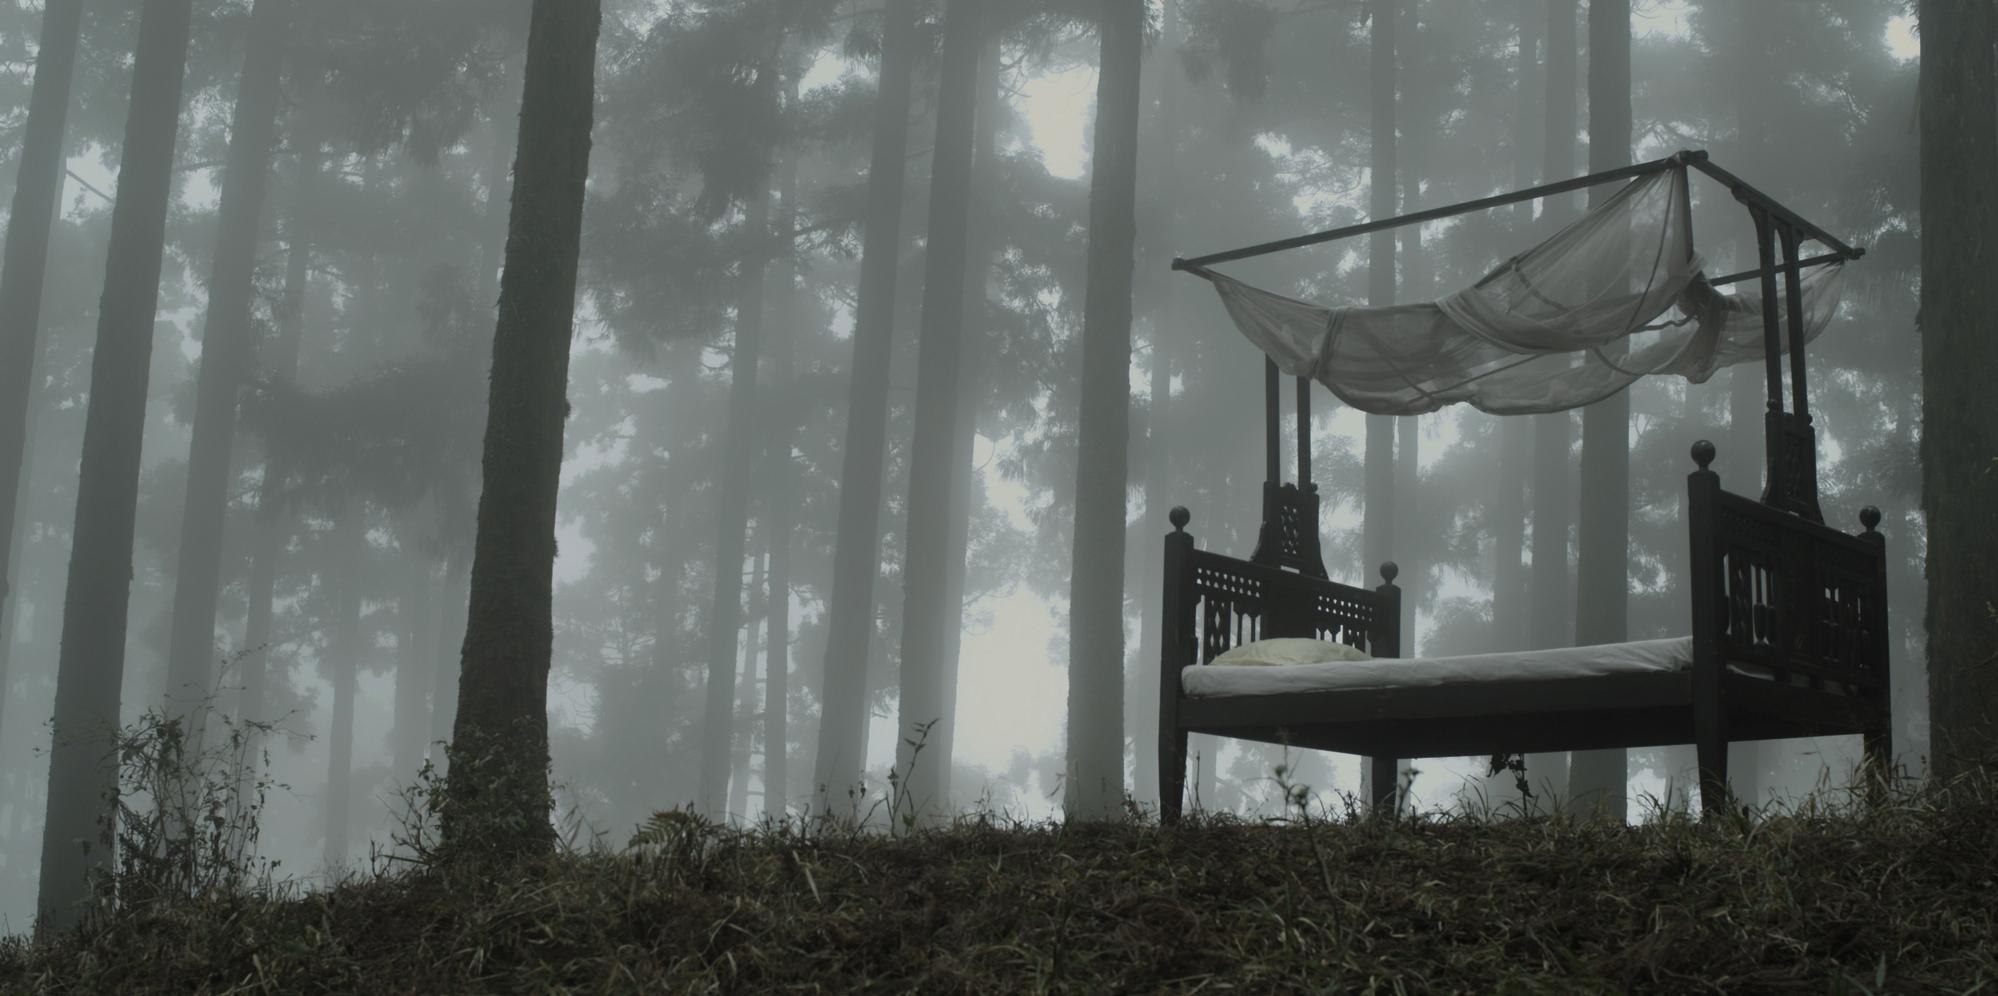 Labour of Love: una suggestiva immagine del film di Adityavikram Sengupta